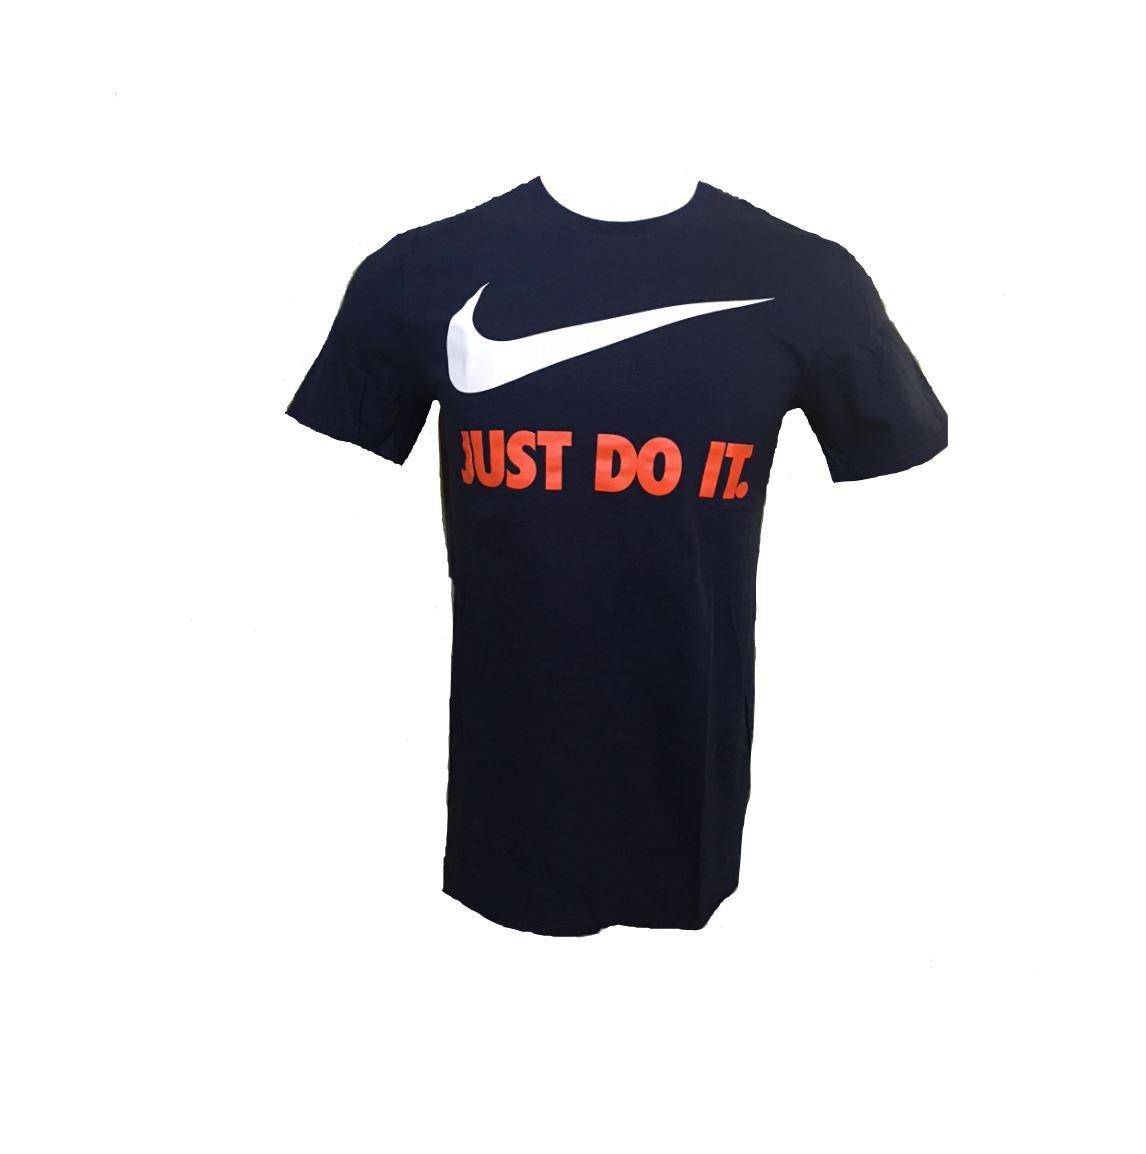 Nike Men's Sportswear New Just Do It Swoosh Tee (Small, Navy Blue/White/Red)